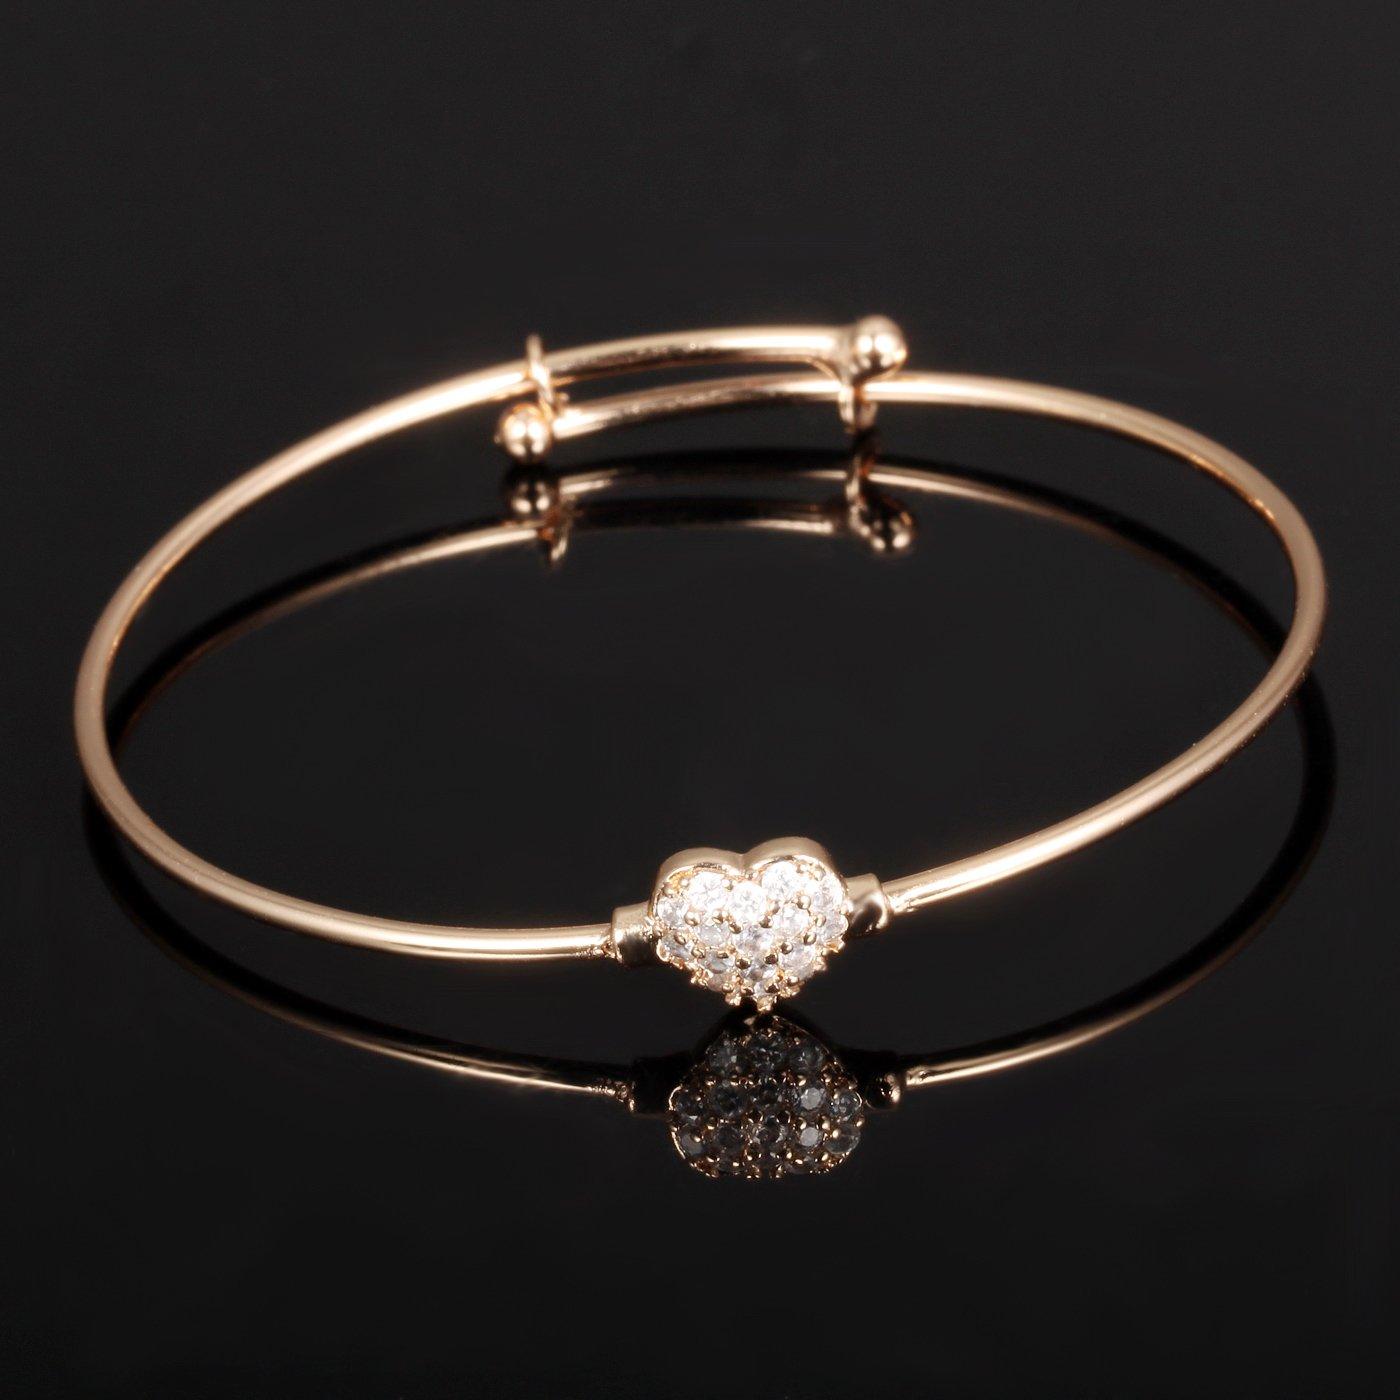 Cute Rose Gold Tone Cubic Zircon Love Heart Bangle For Children Girls Expandable Length 5.9-7.87